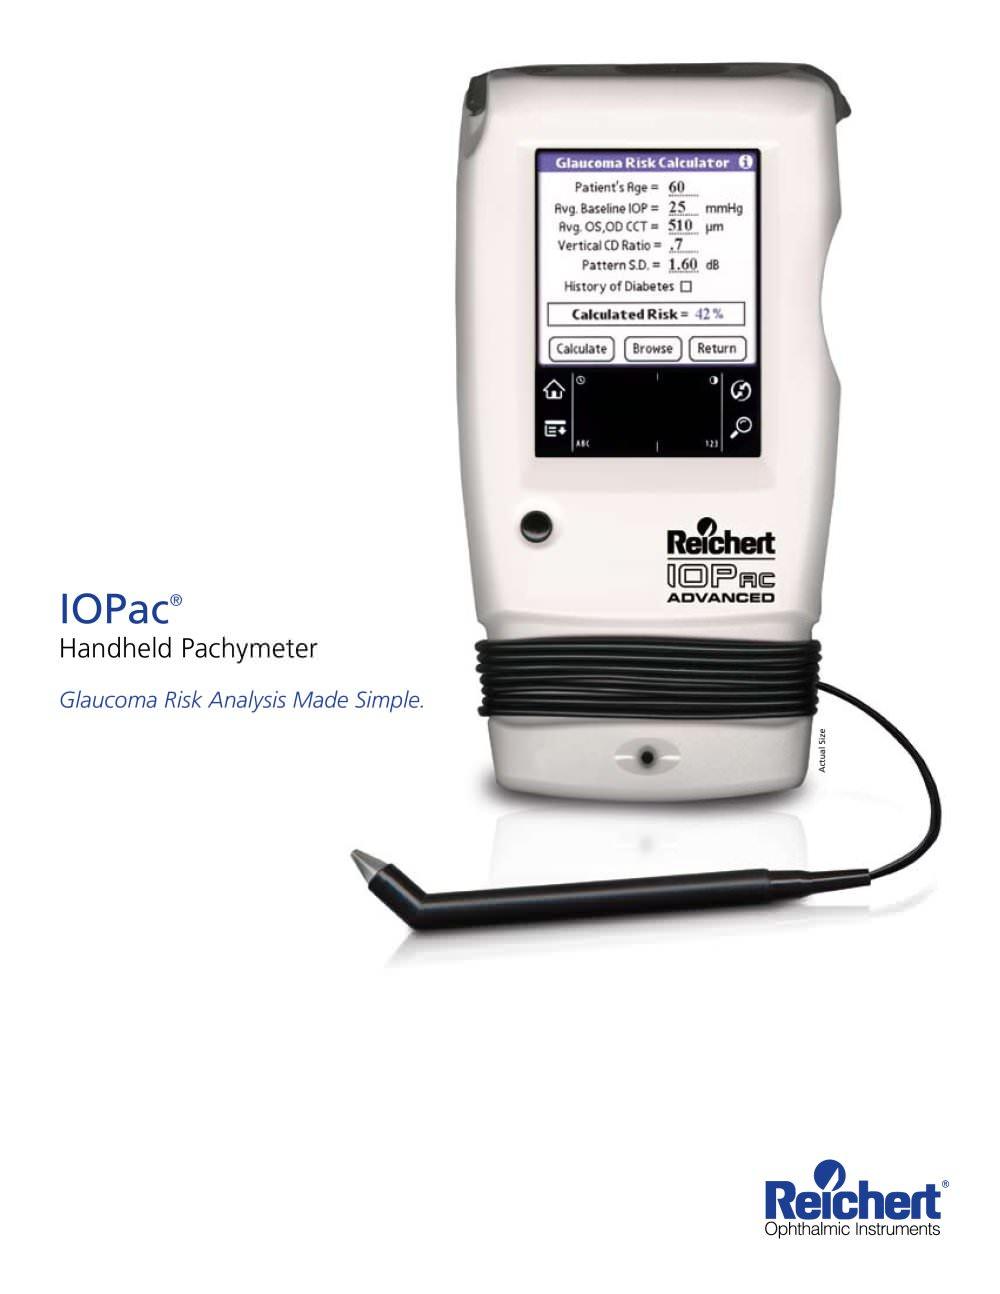 Reichert IOPac Advanced Pachymeter.jpg